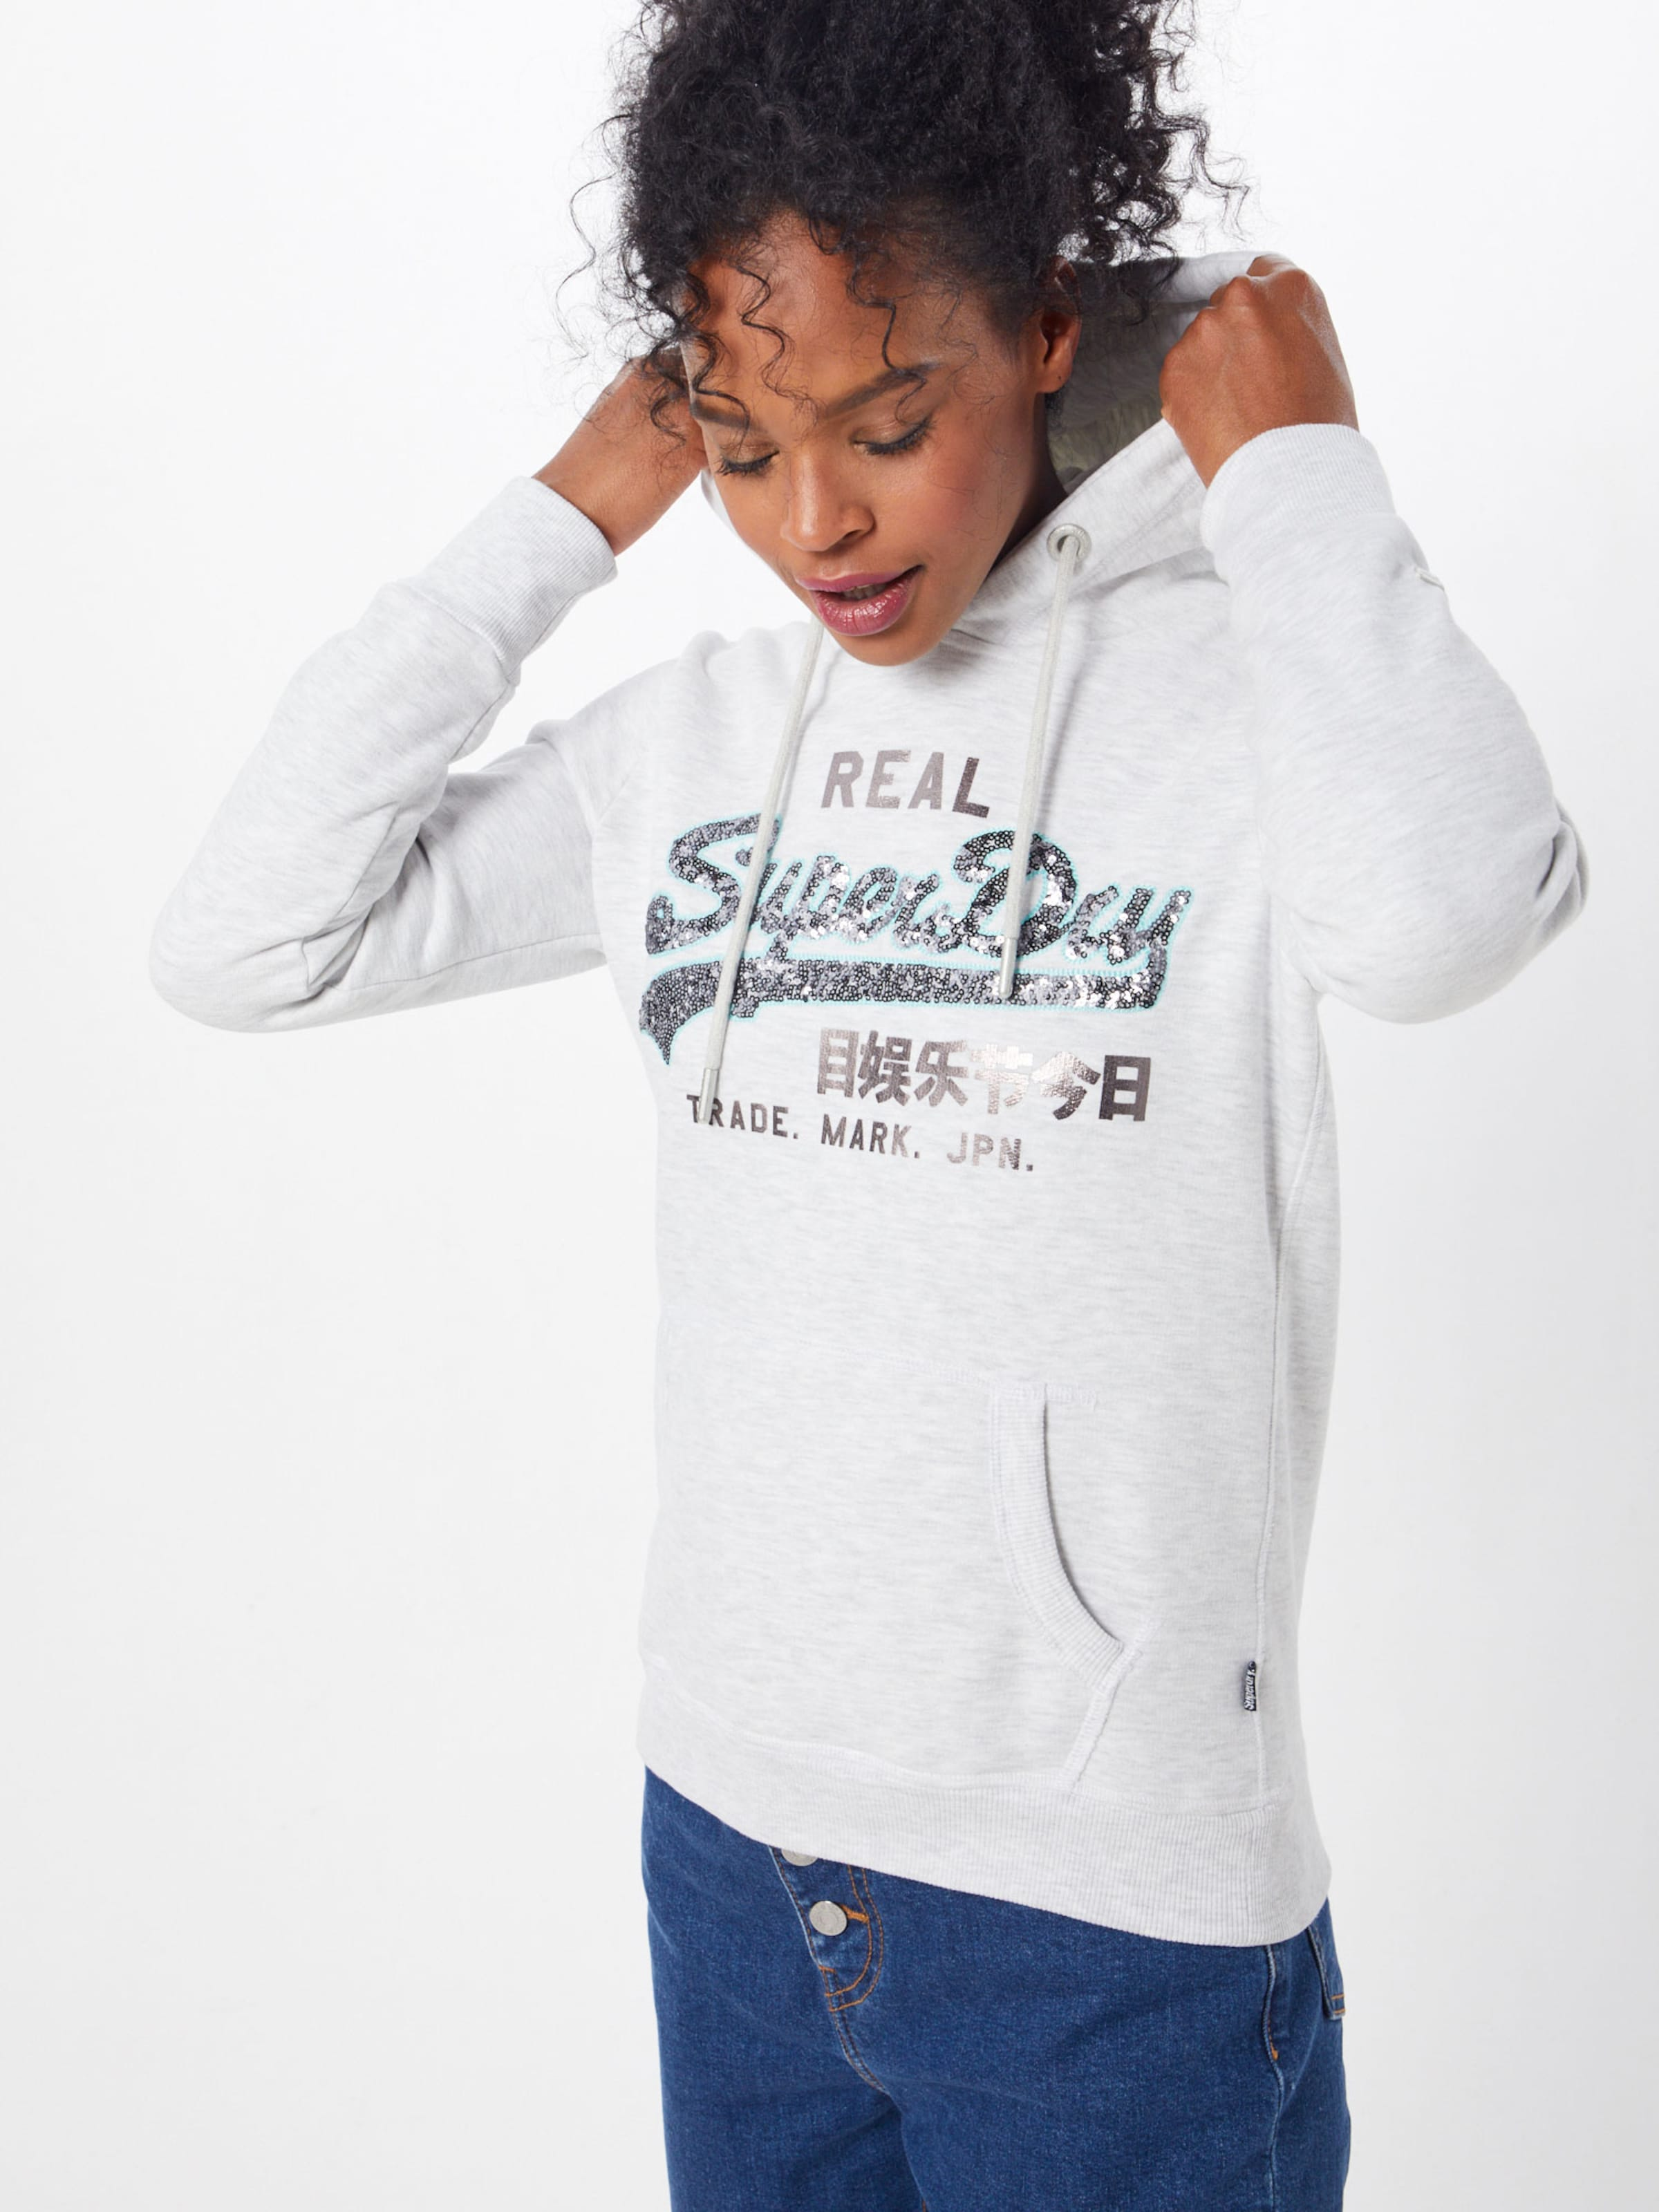 Line shirt Logo Superdry Cassé Sweat Blanc Entry Hood' Sequin 'v En 3AqRc4L5Sj